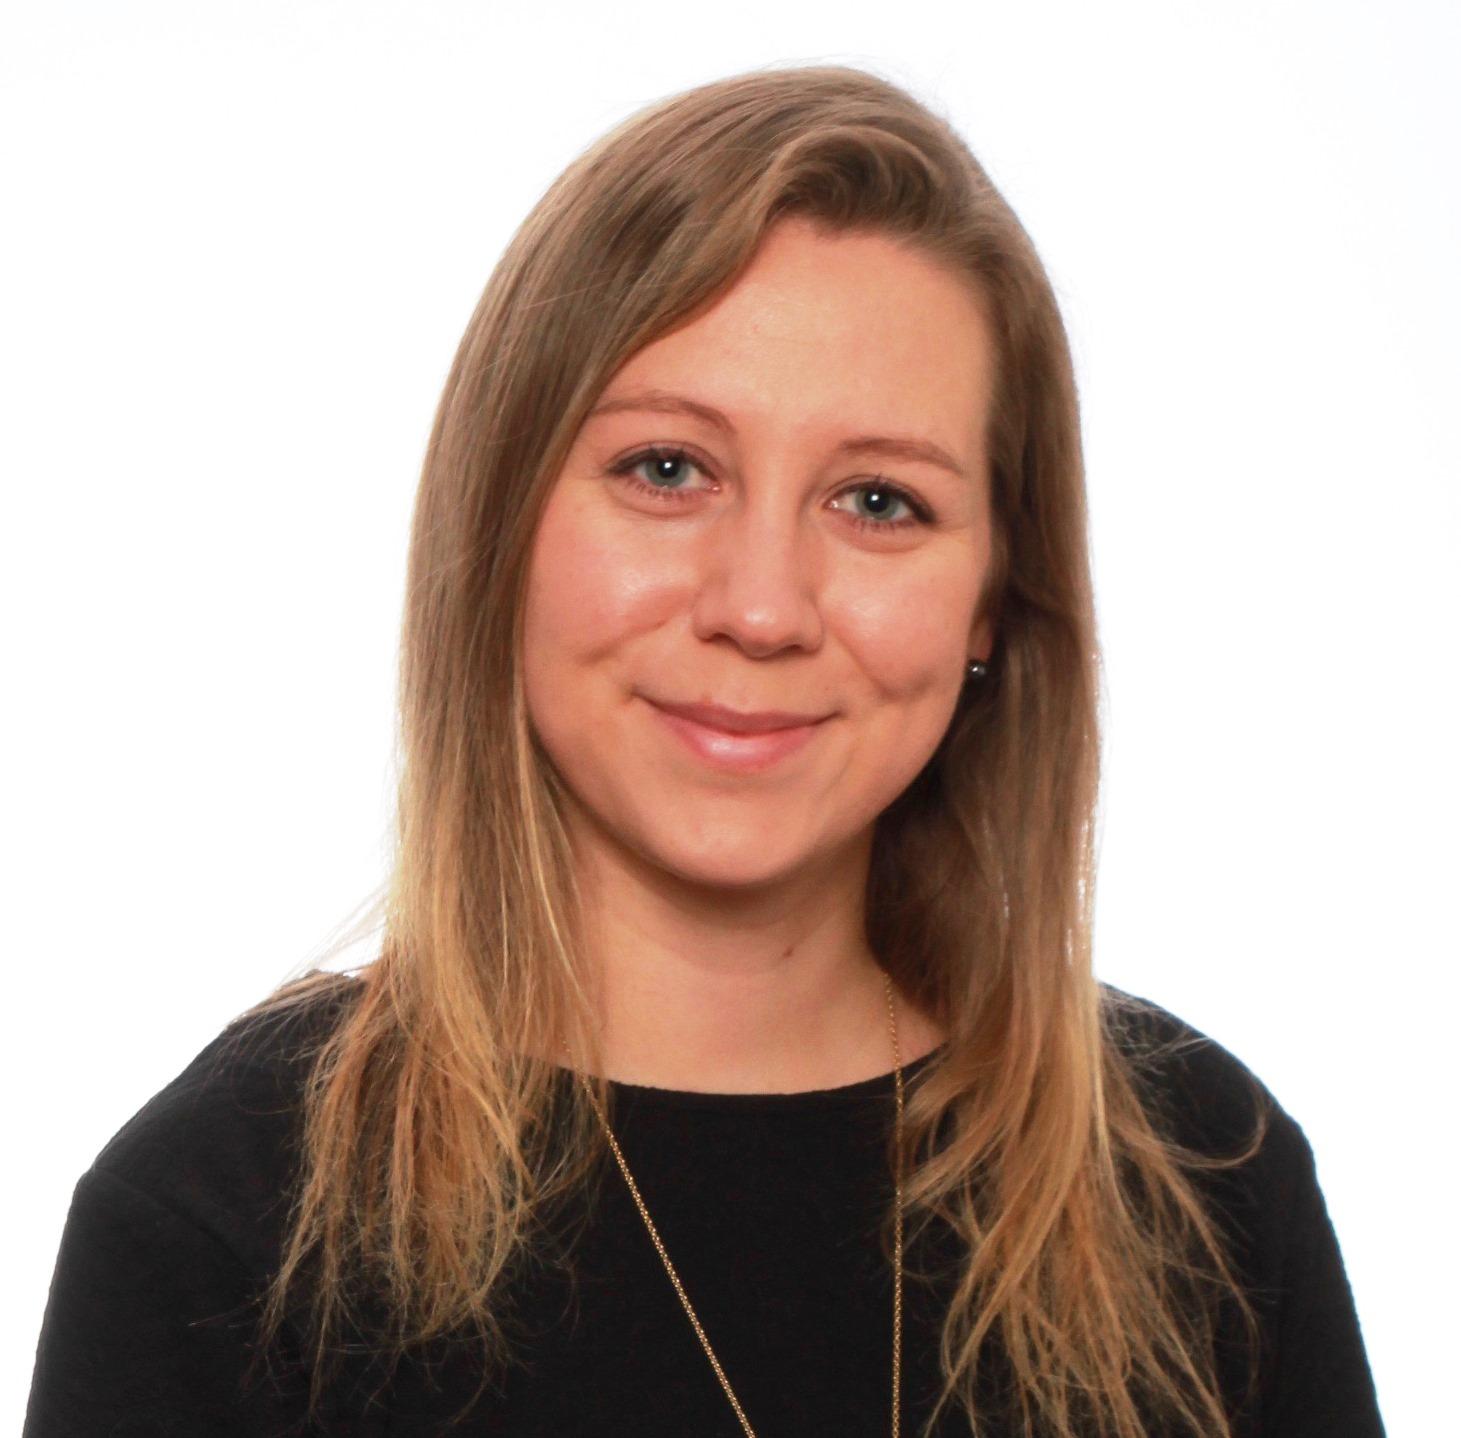 Christa Blomberg